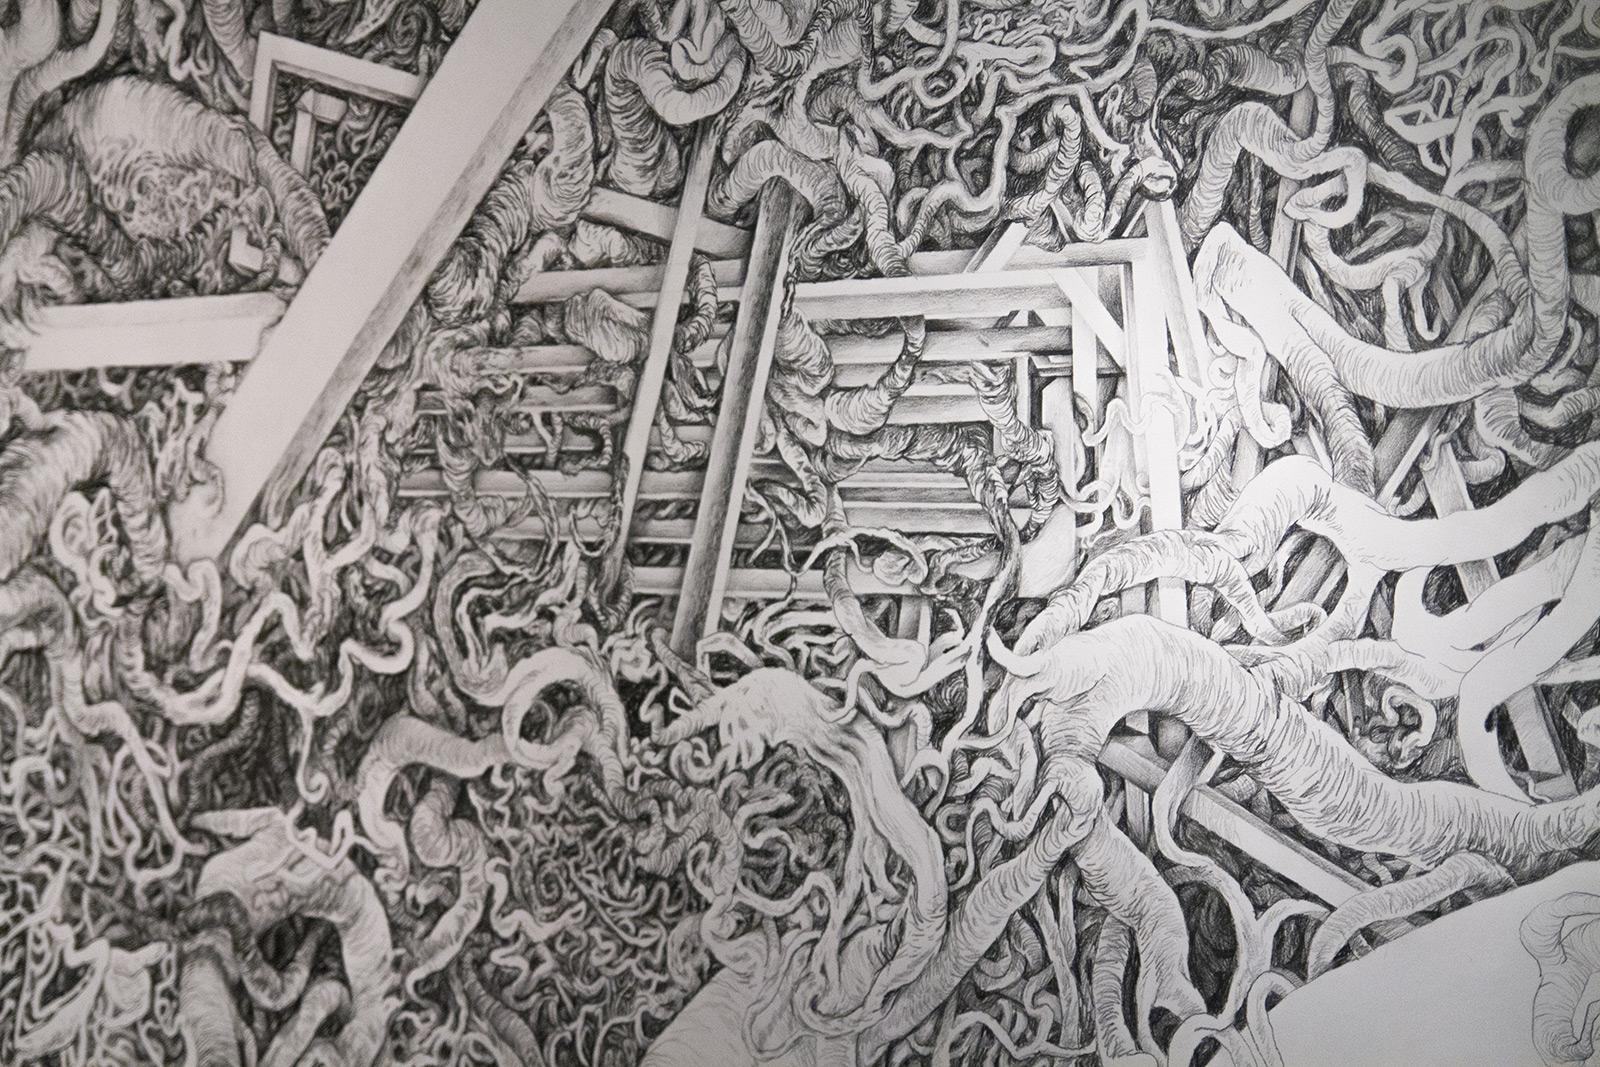 Symbiosis, 2013 (Detail)